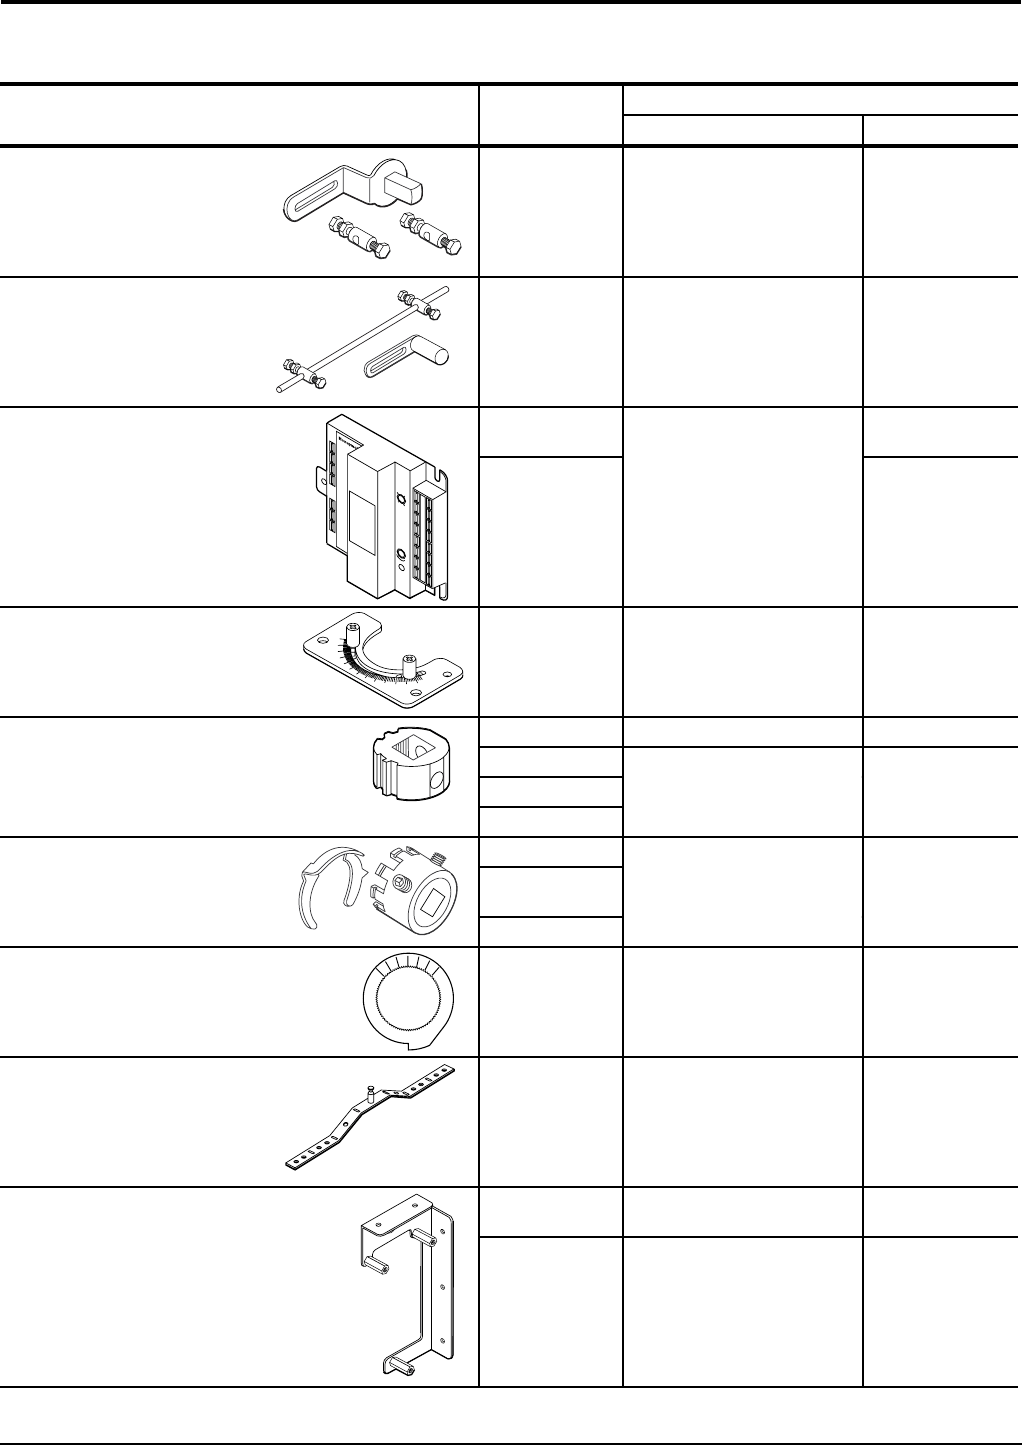 honeywell pressure transmitter wiring diagram 2000 ford expedition alternator outstanding damper module